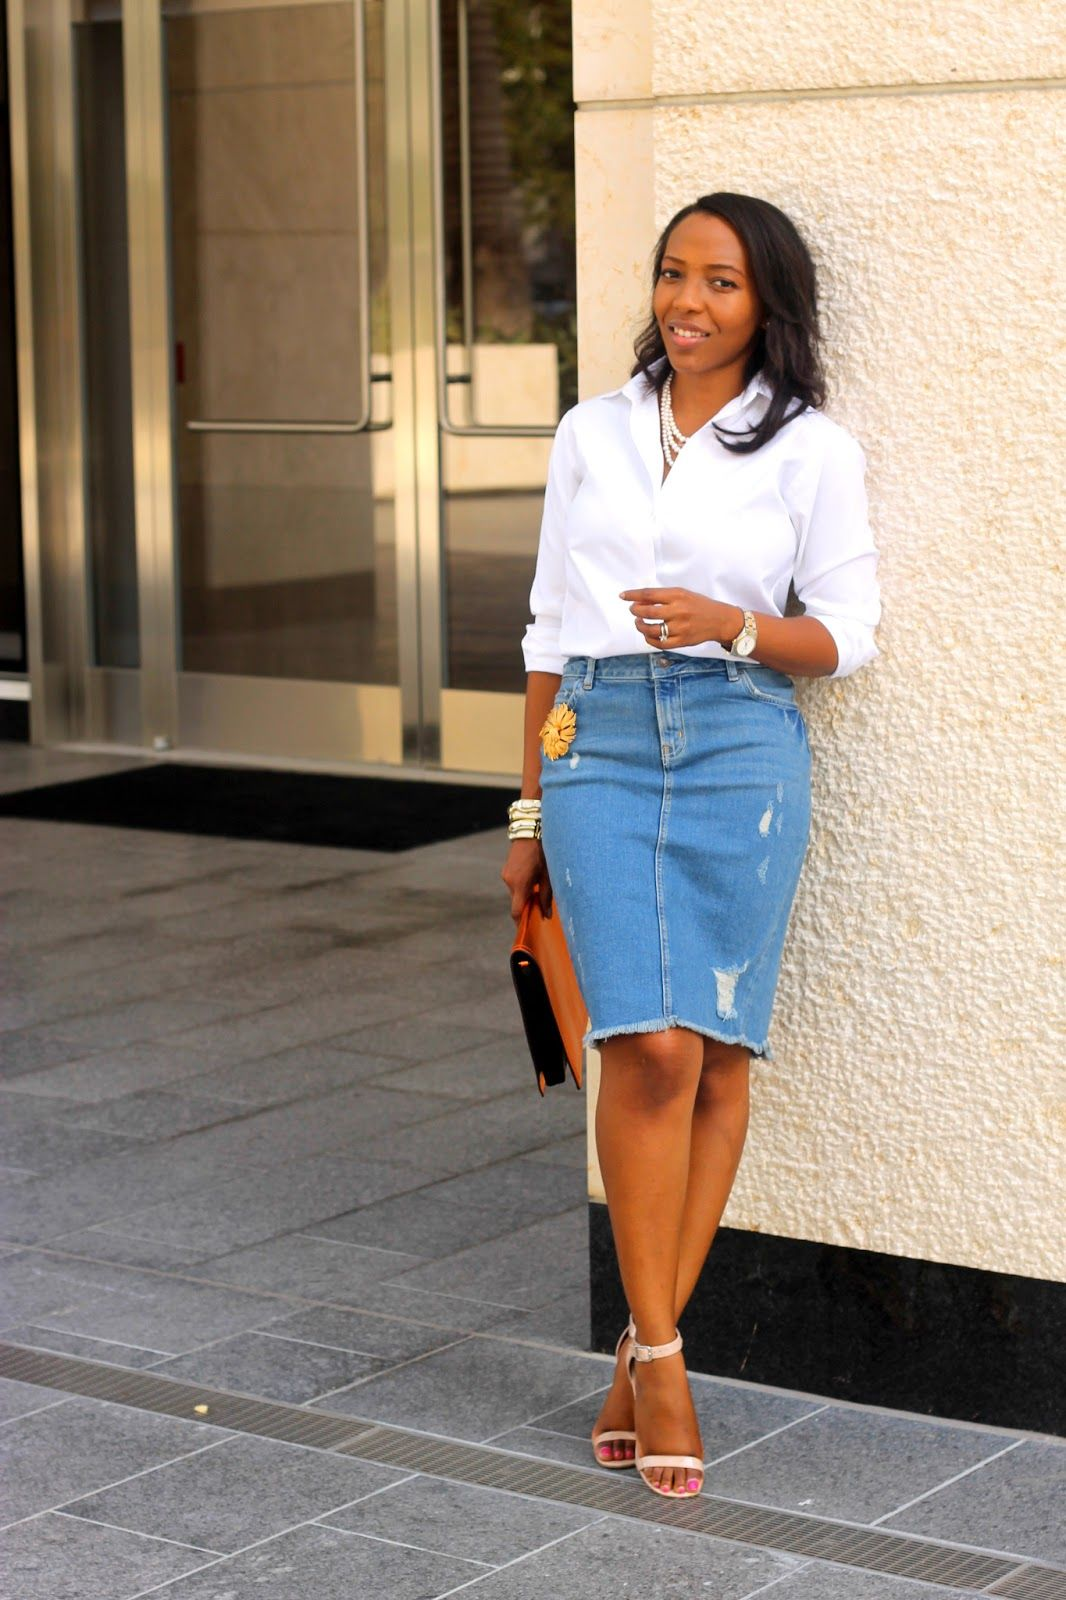 381ac34b6 Distressed Denim + White Button Down | Looks | Fashion, Denim skirt ...